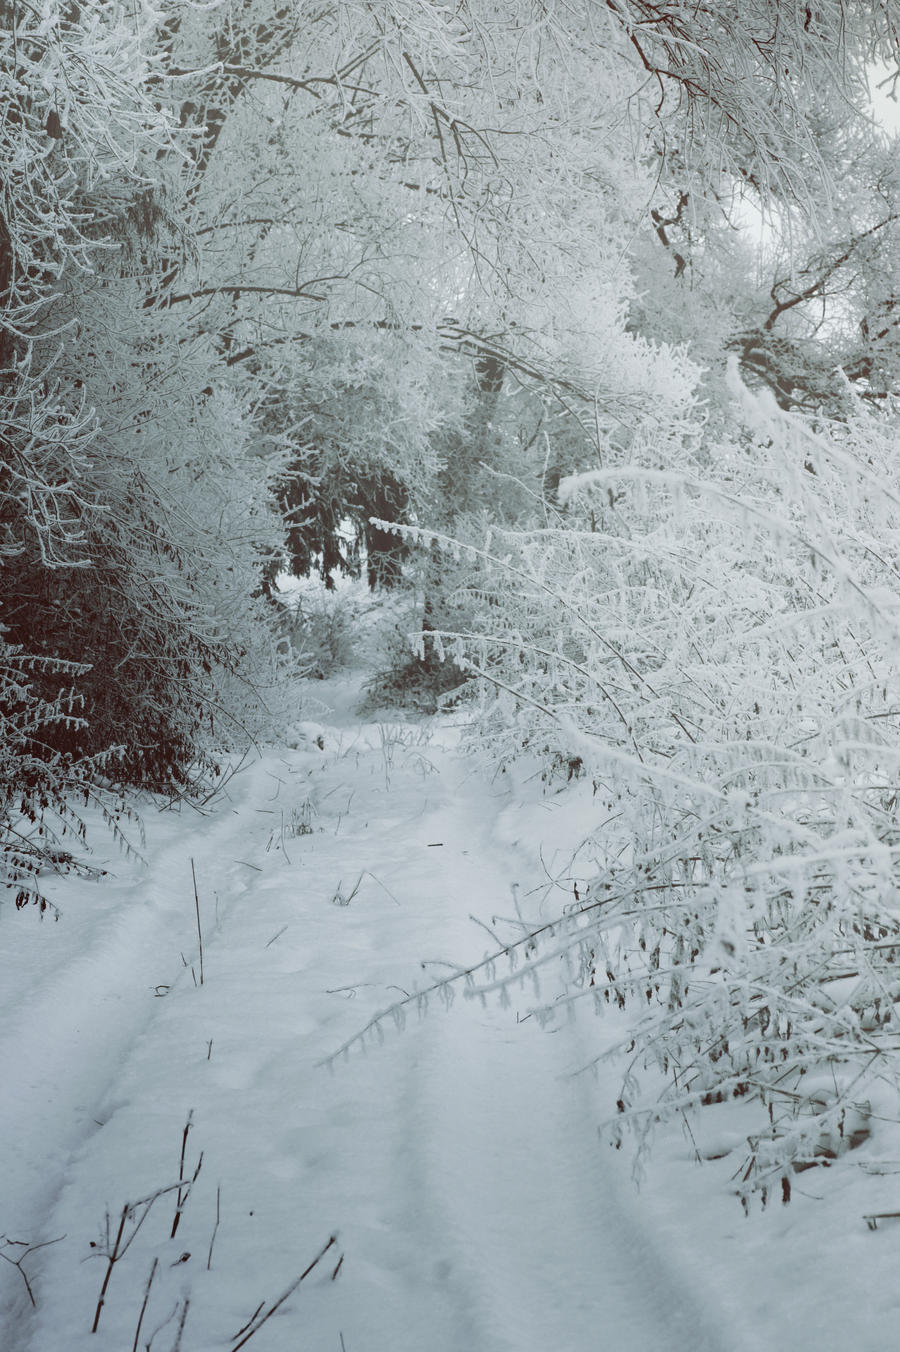 Winter Wonderland by SoranoKobayashi